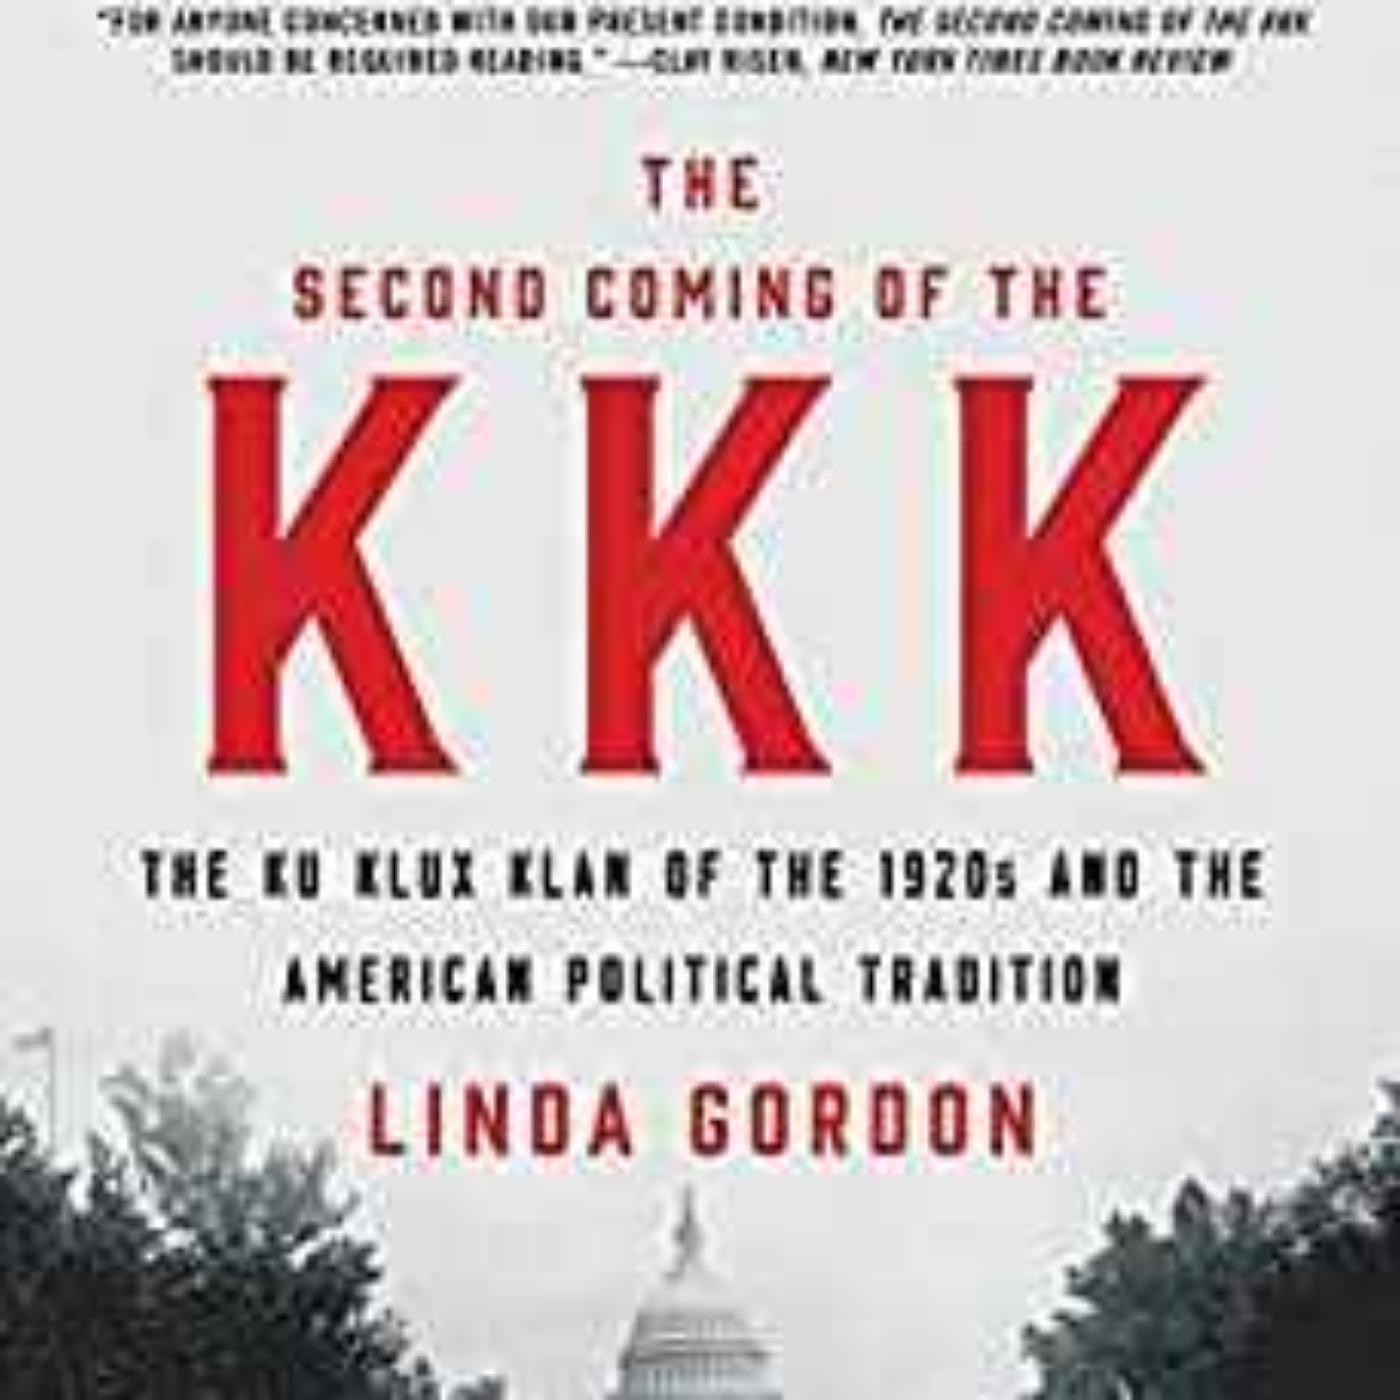 Linda Gordon - The Second Coming of the KKK